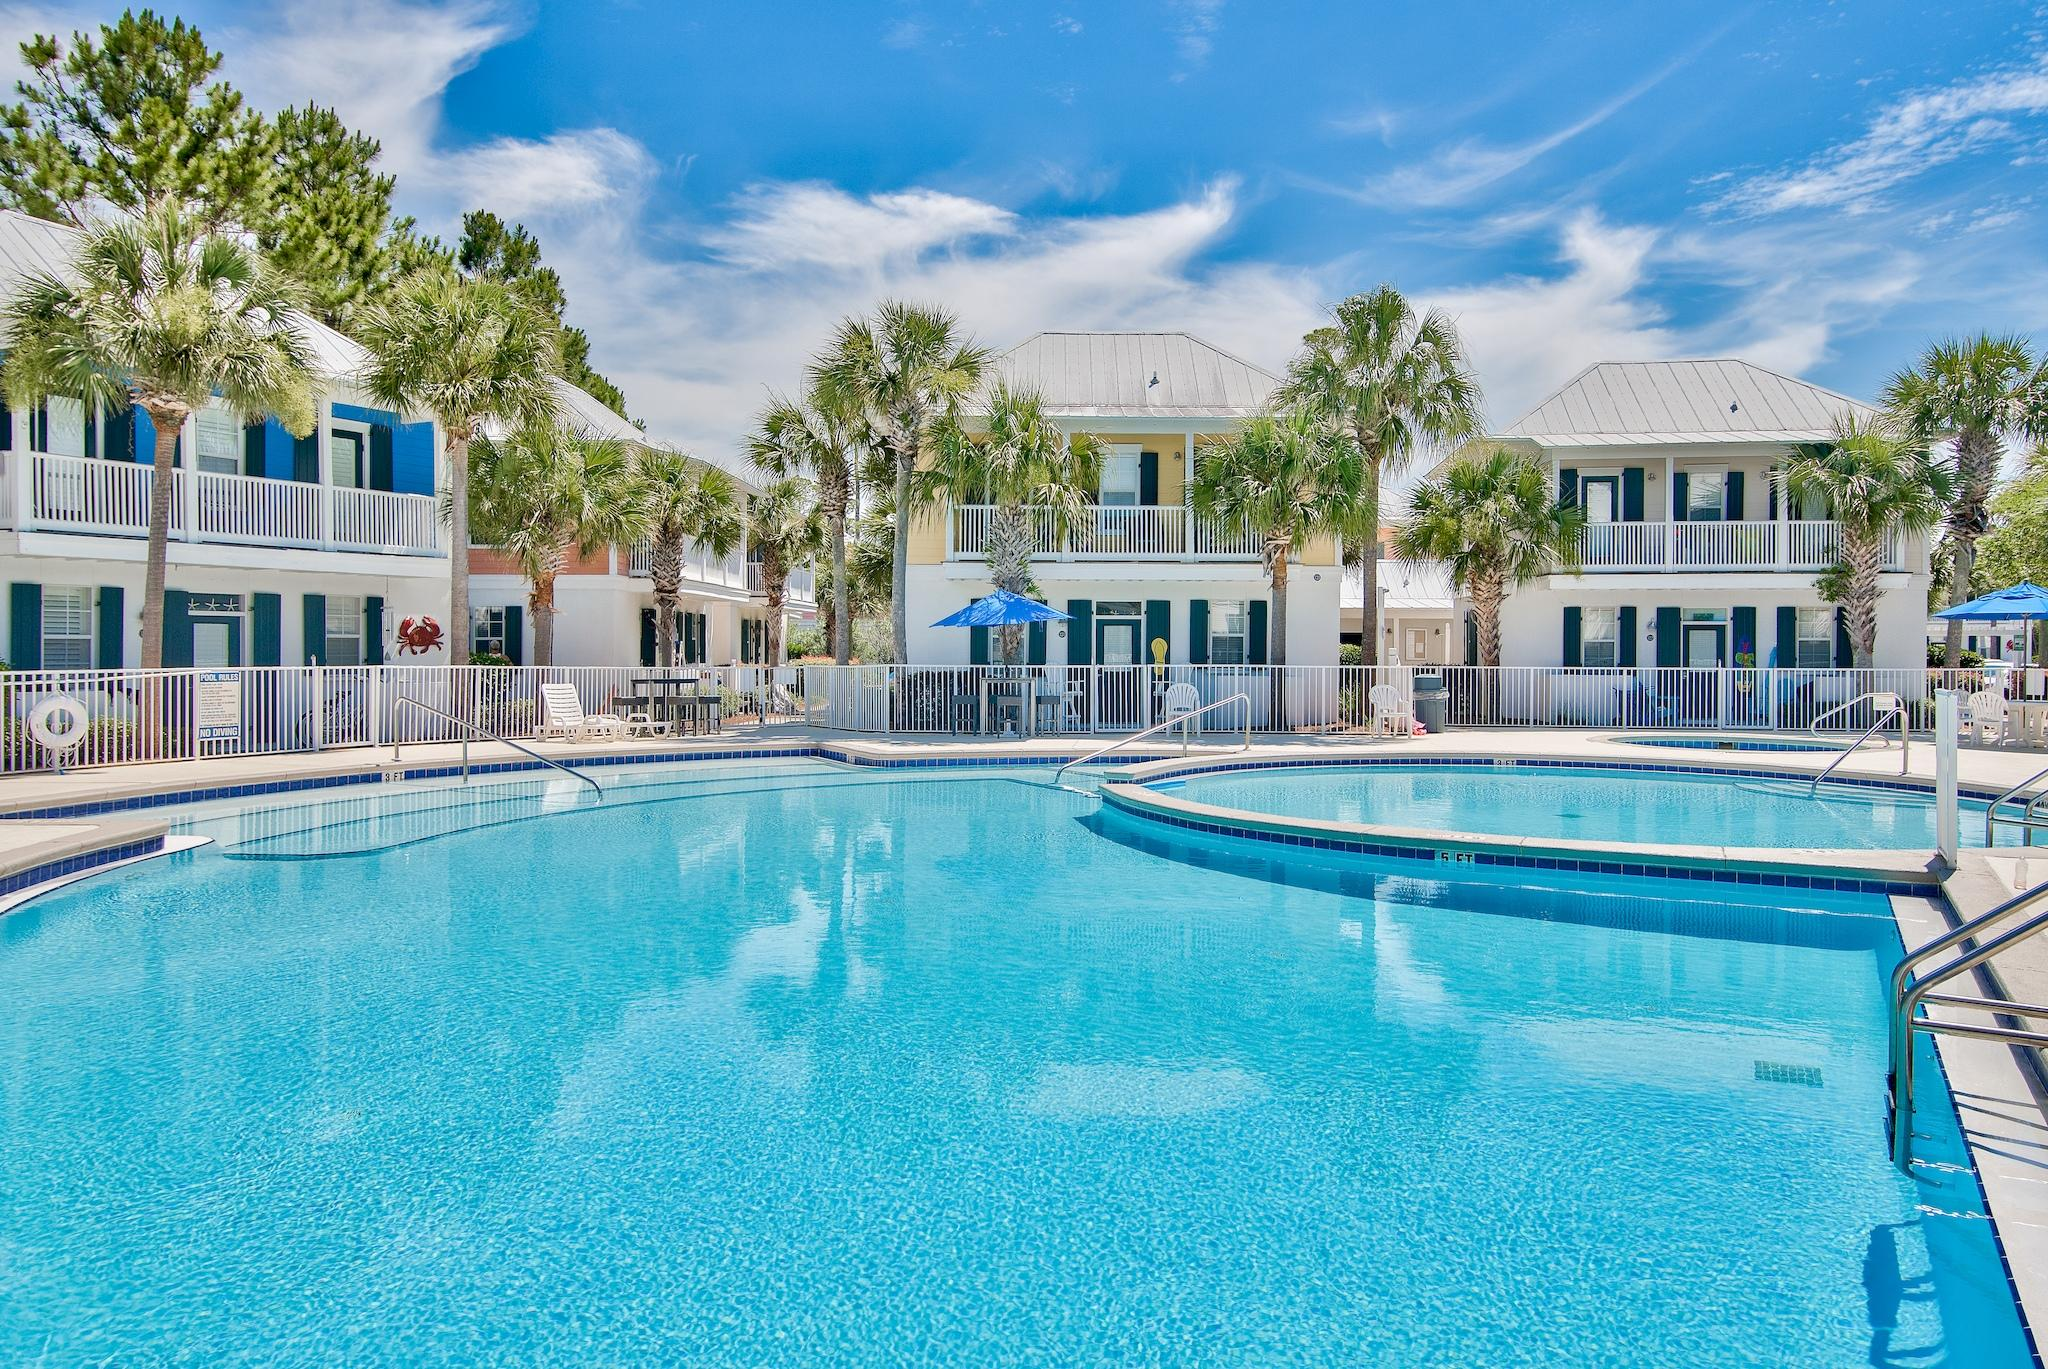 Photo of home for sale at 198 Somerset Bridge, Santa Rosa Beach FL